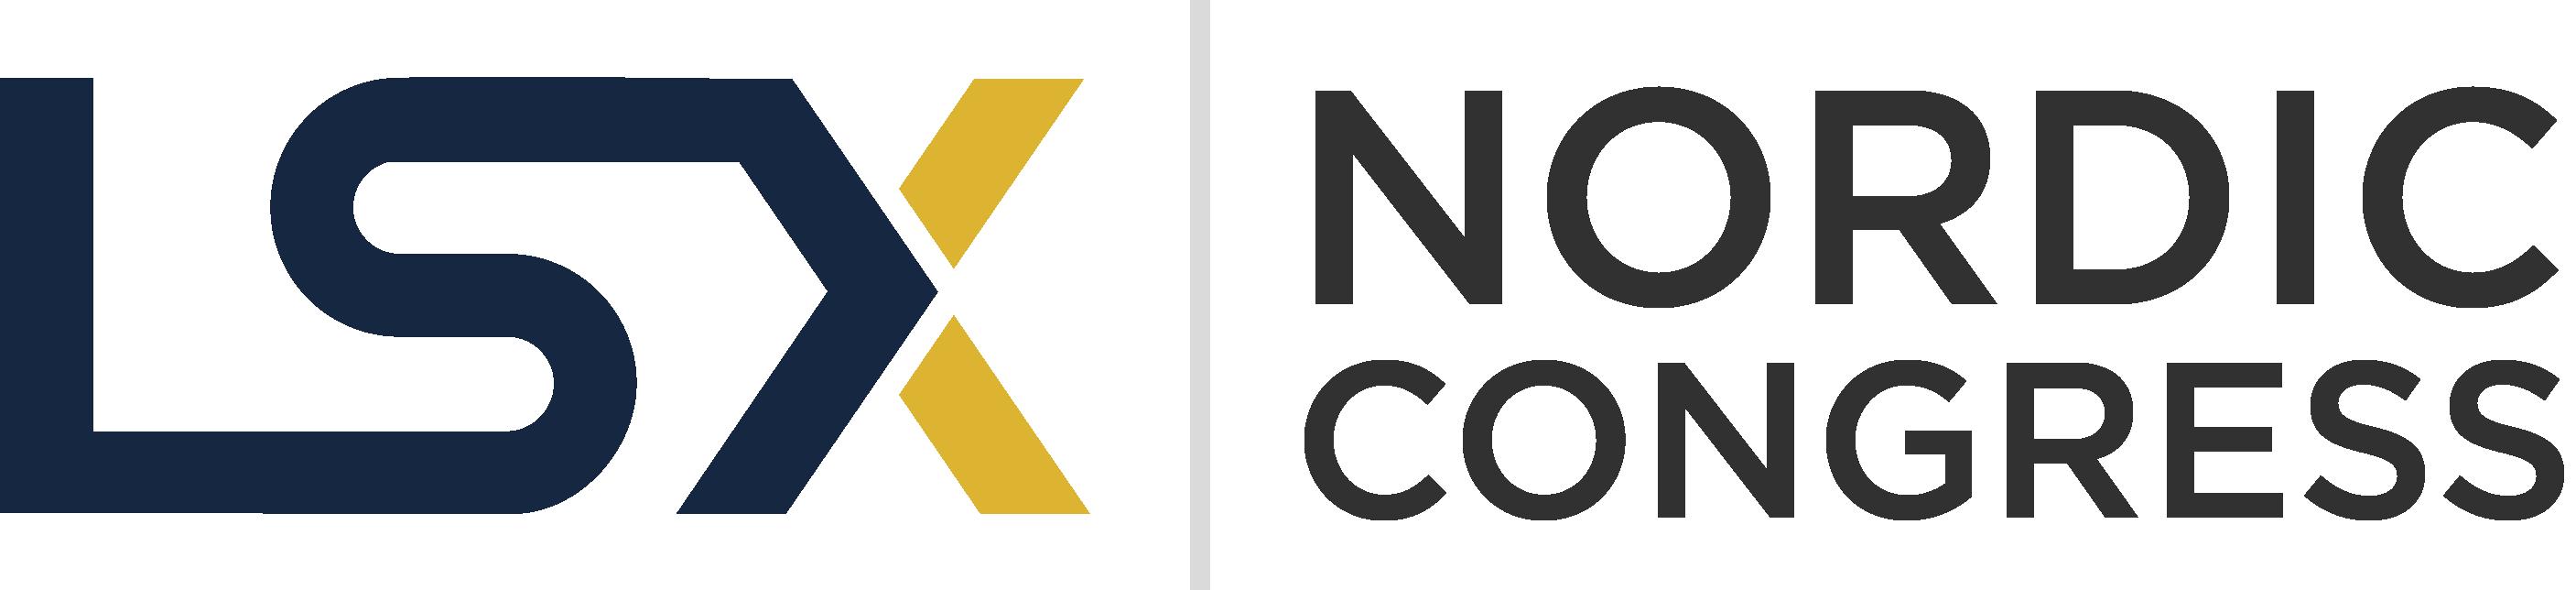 LSX Nordic Congress-1